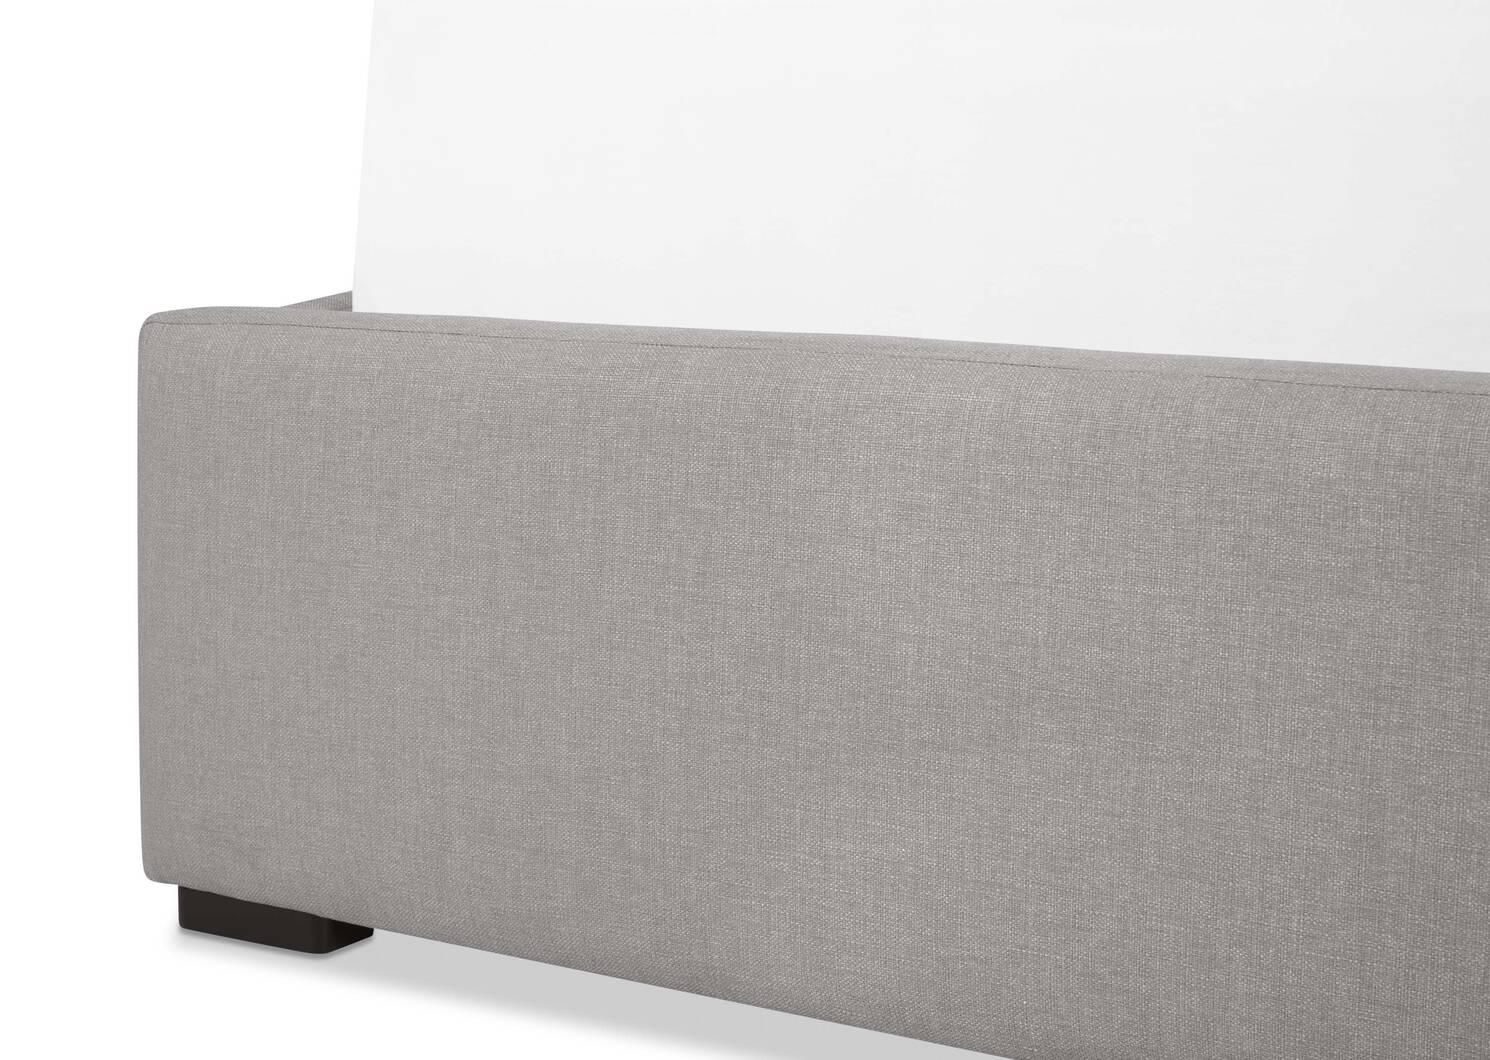 Rolston Custom Storage Bed